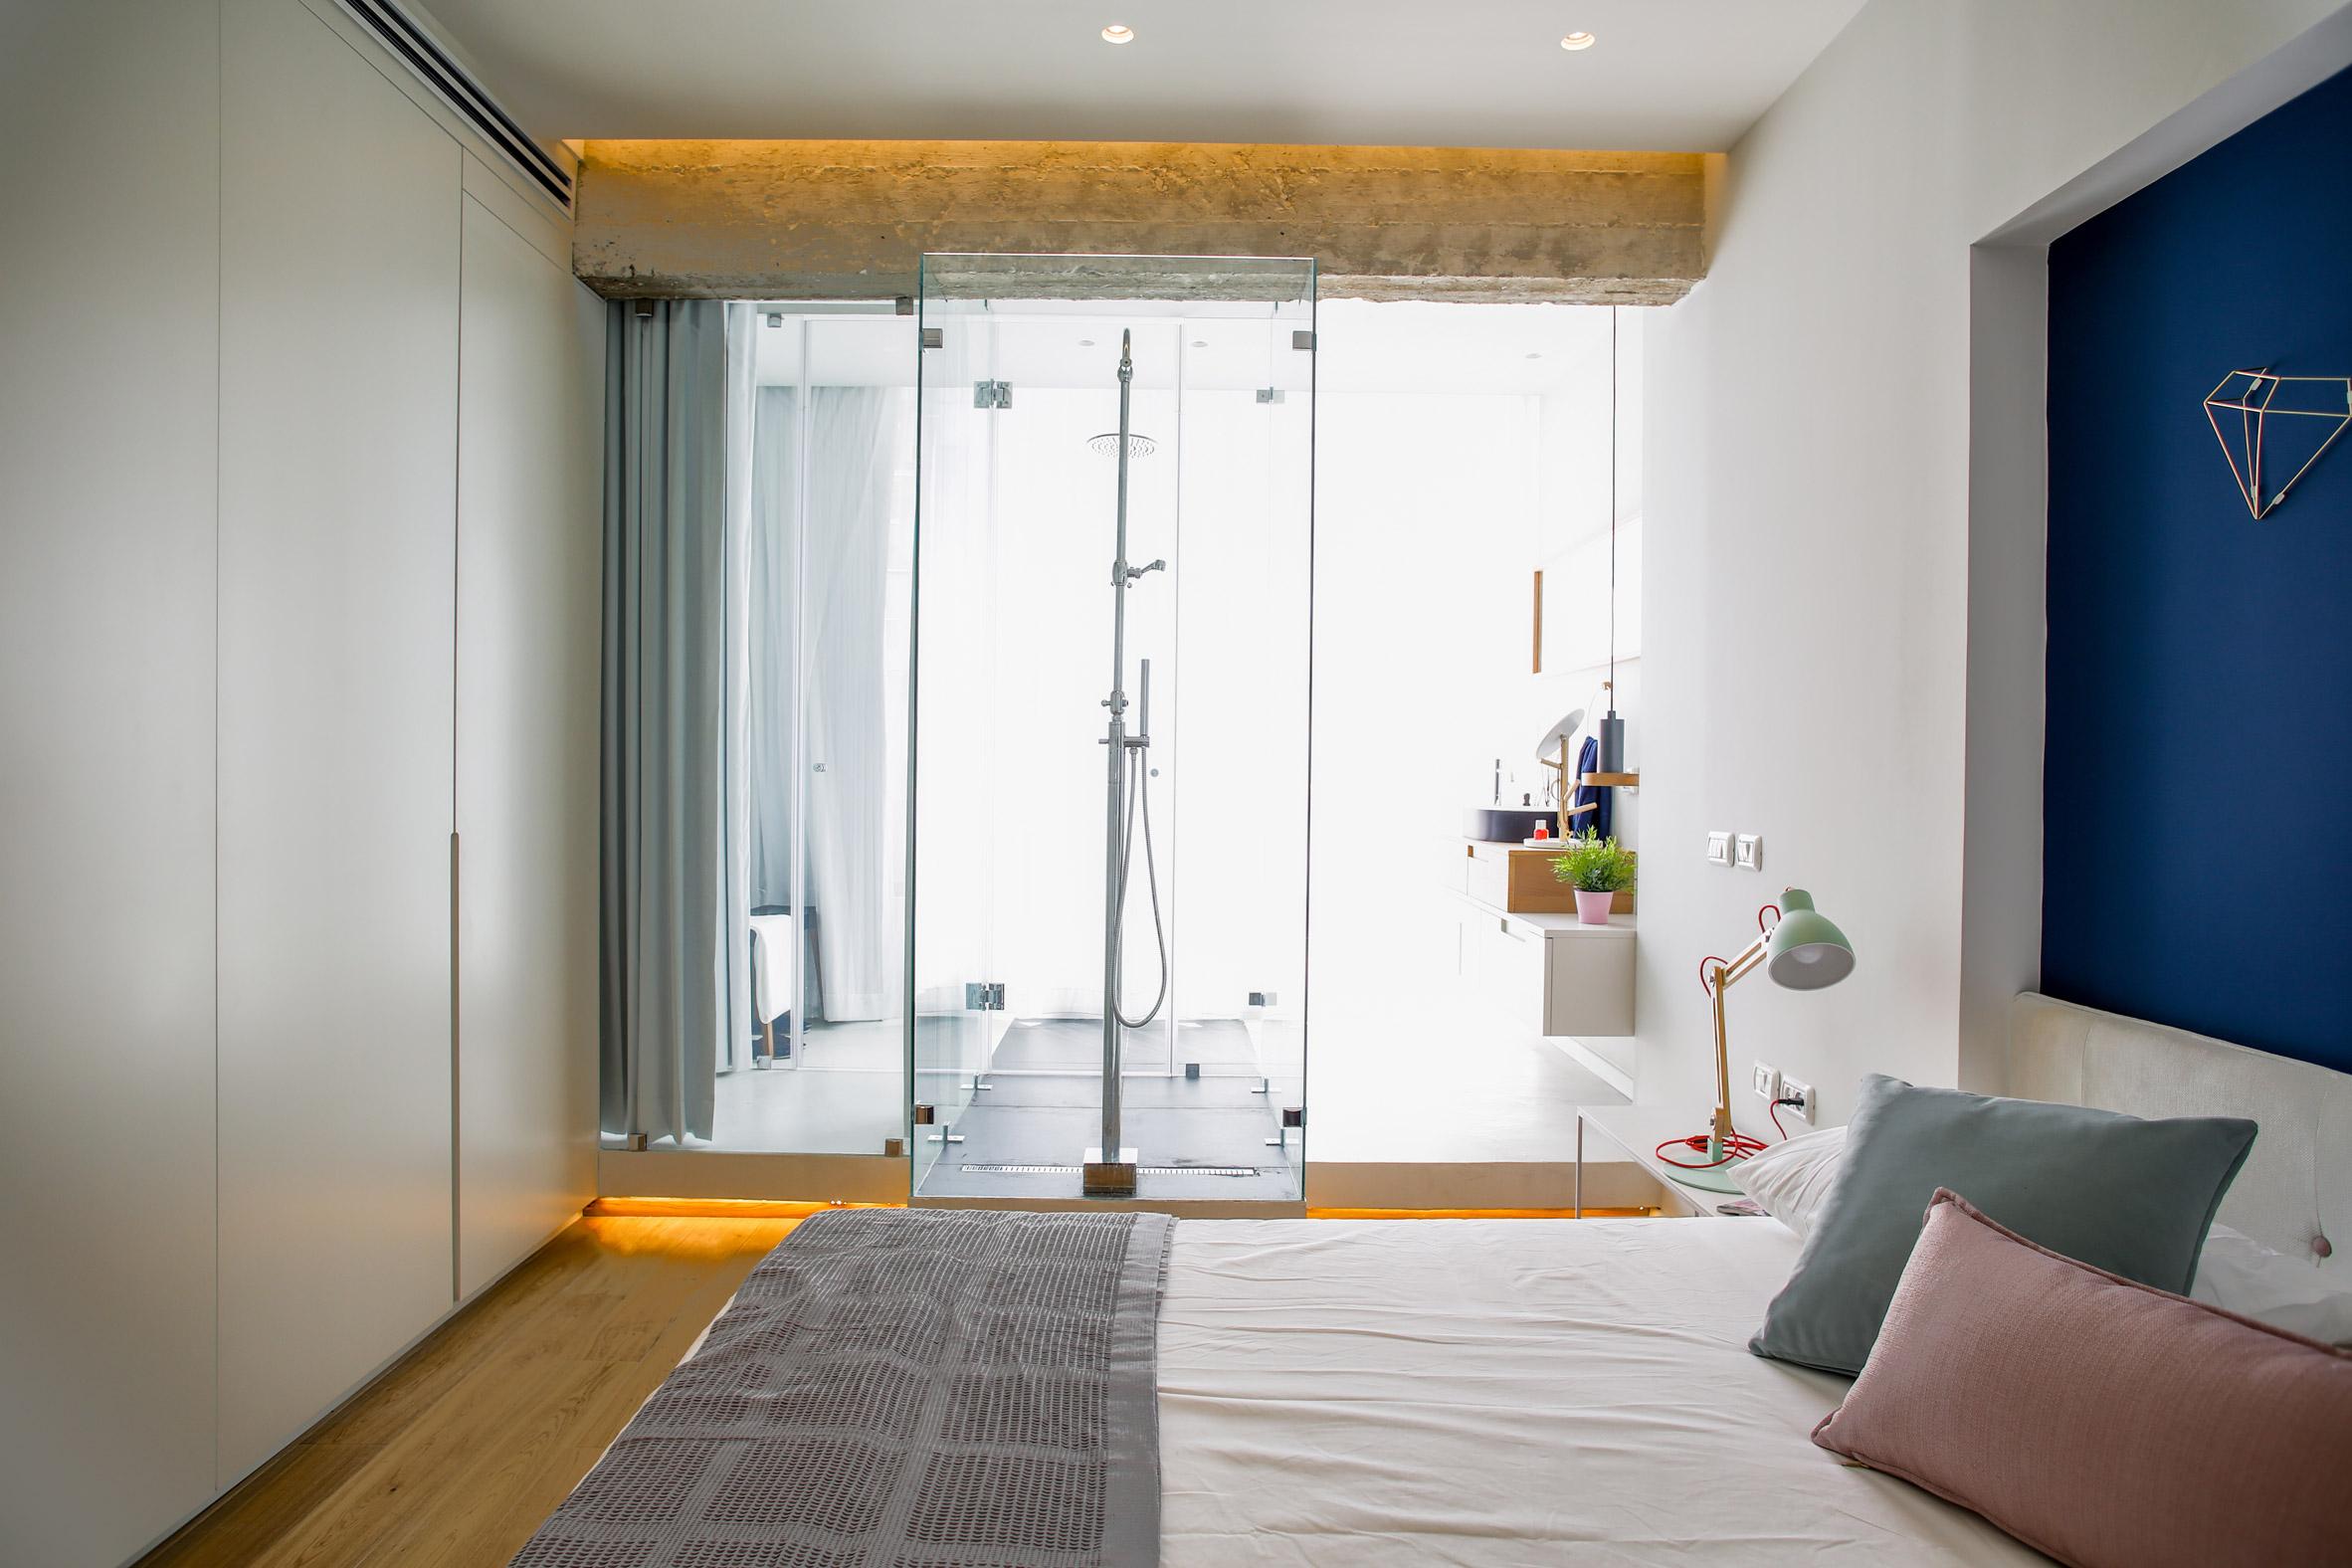 weisel-apartment-tel-aviv-israel-dori-design-studio-renovation_dezeen_2364_col_21